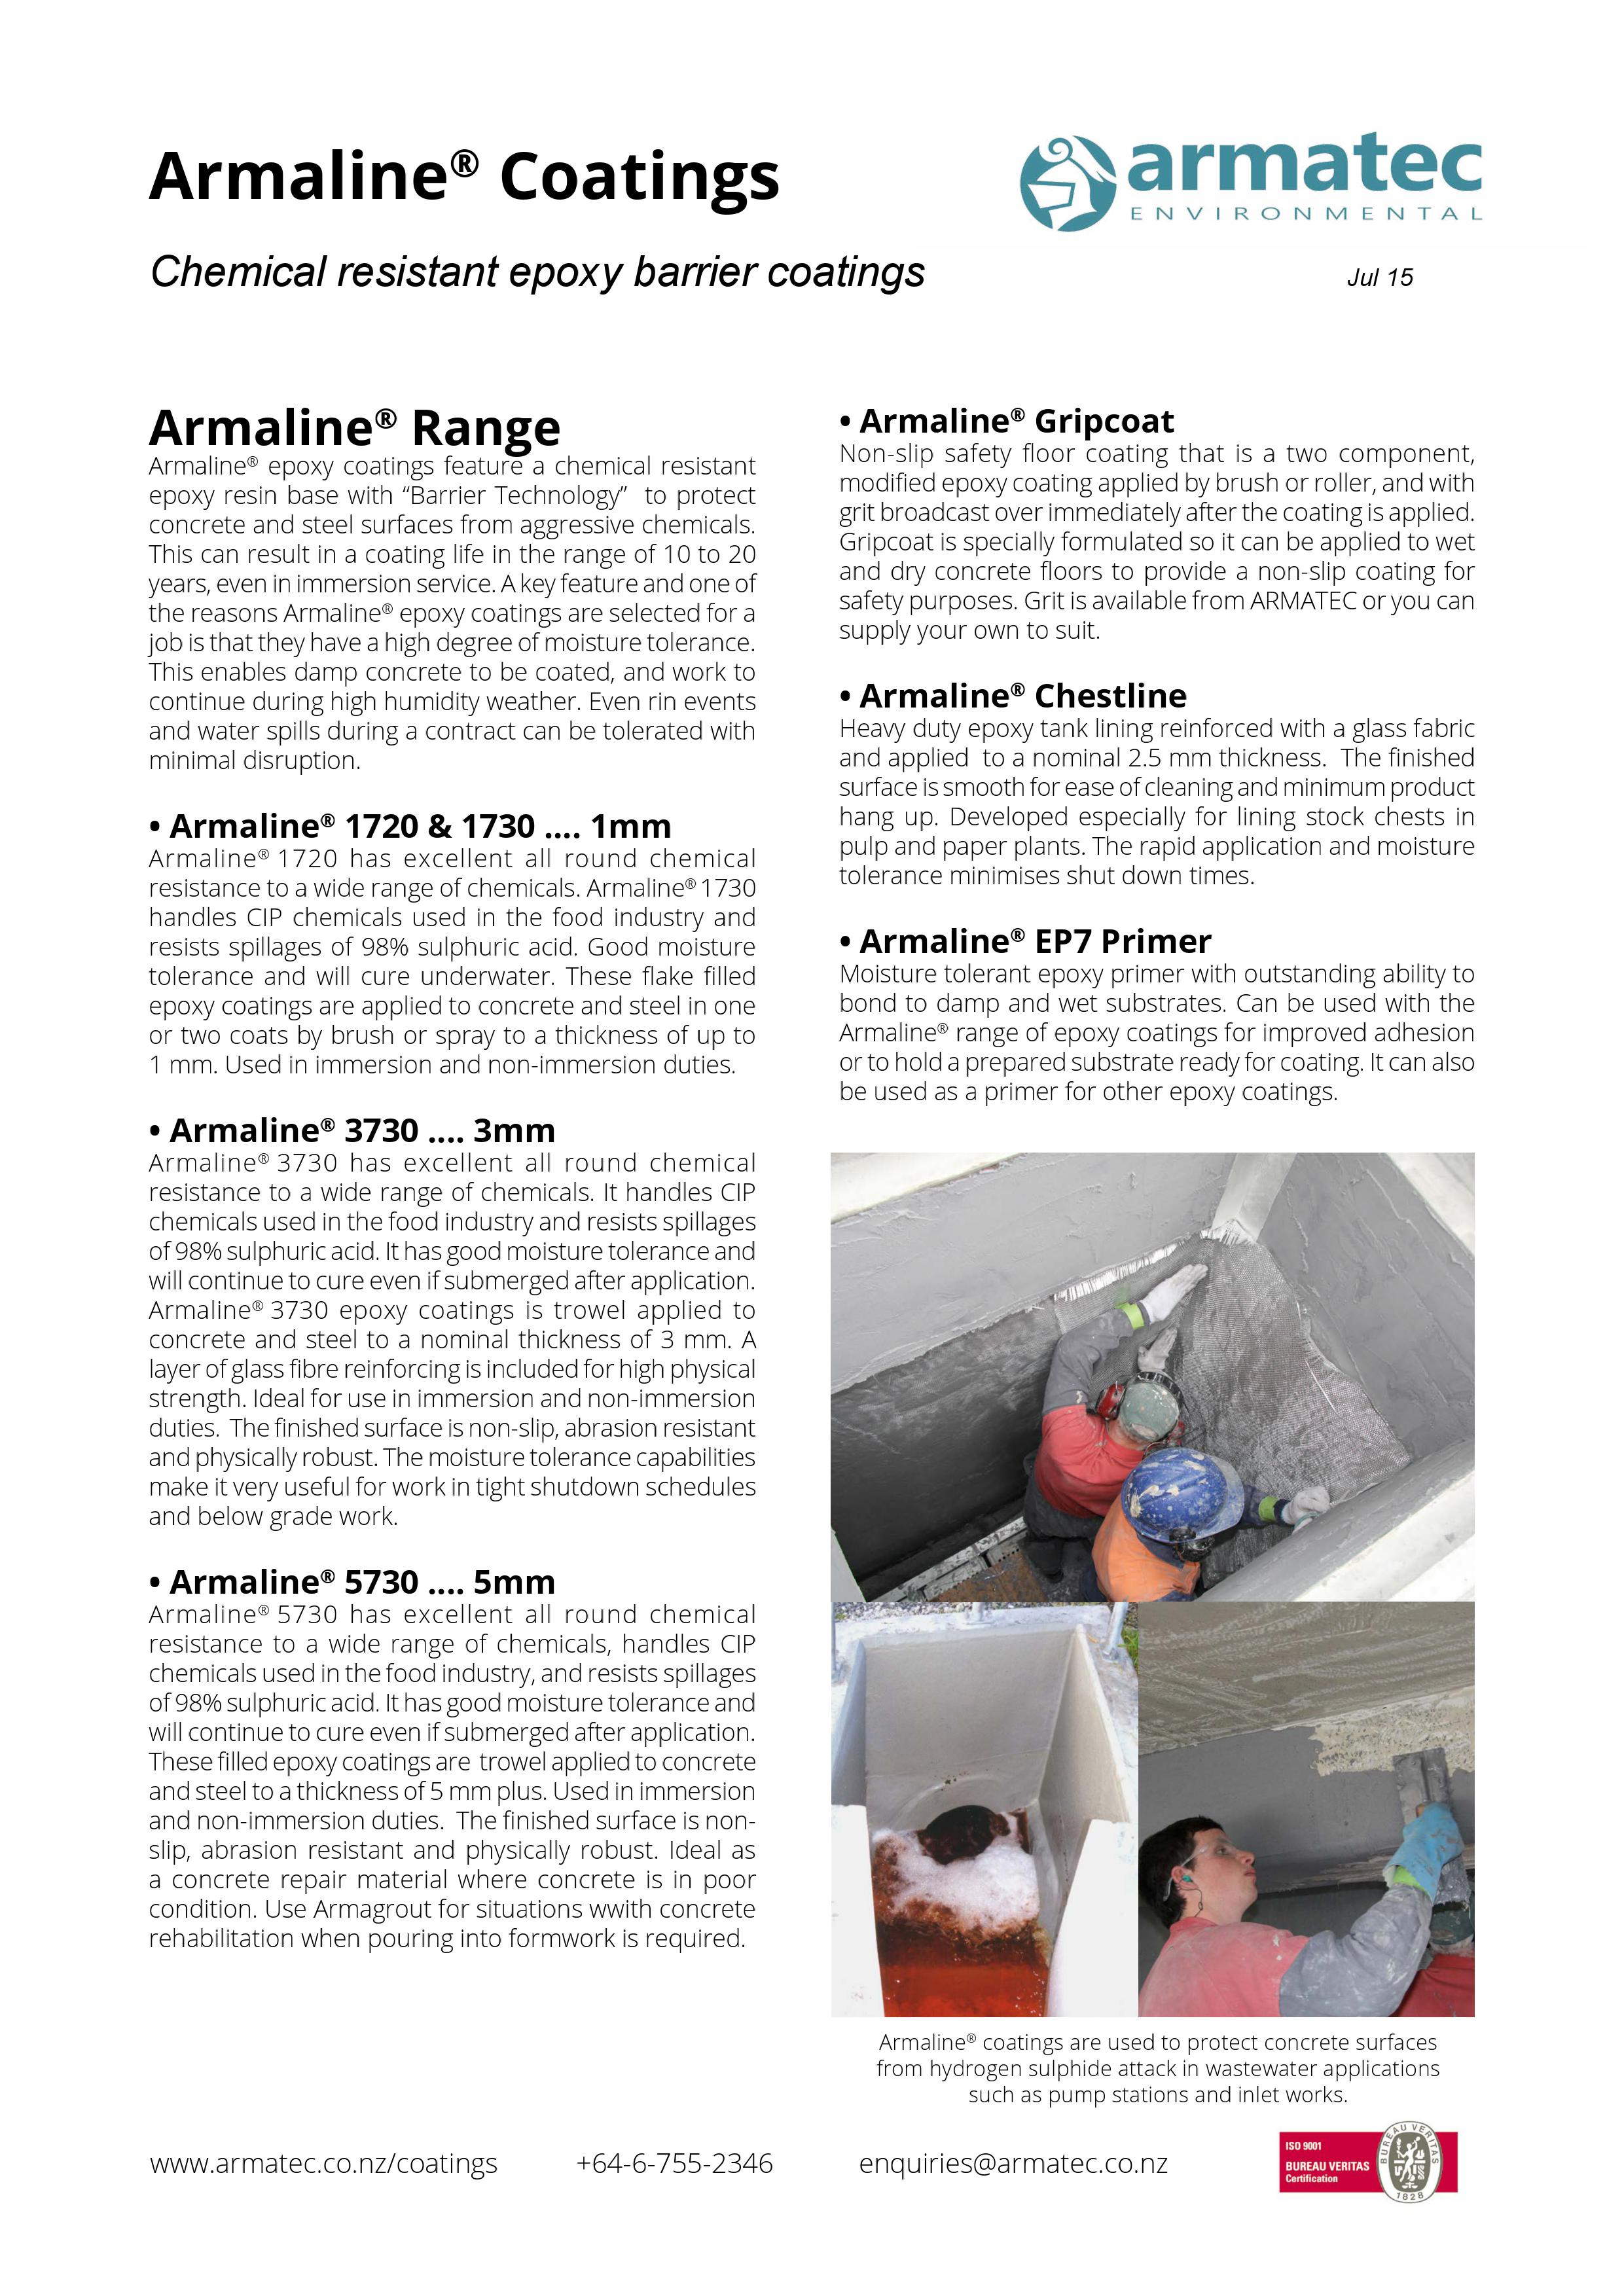 Download the Armaline Epoxy Coatings Handbook